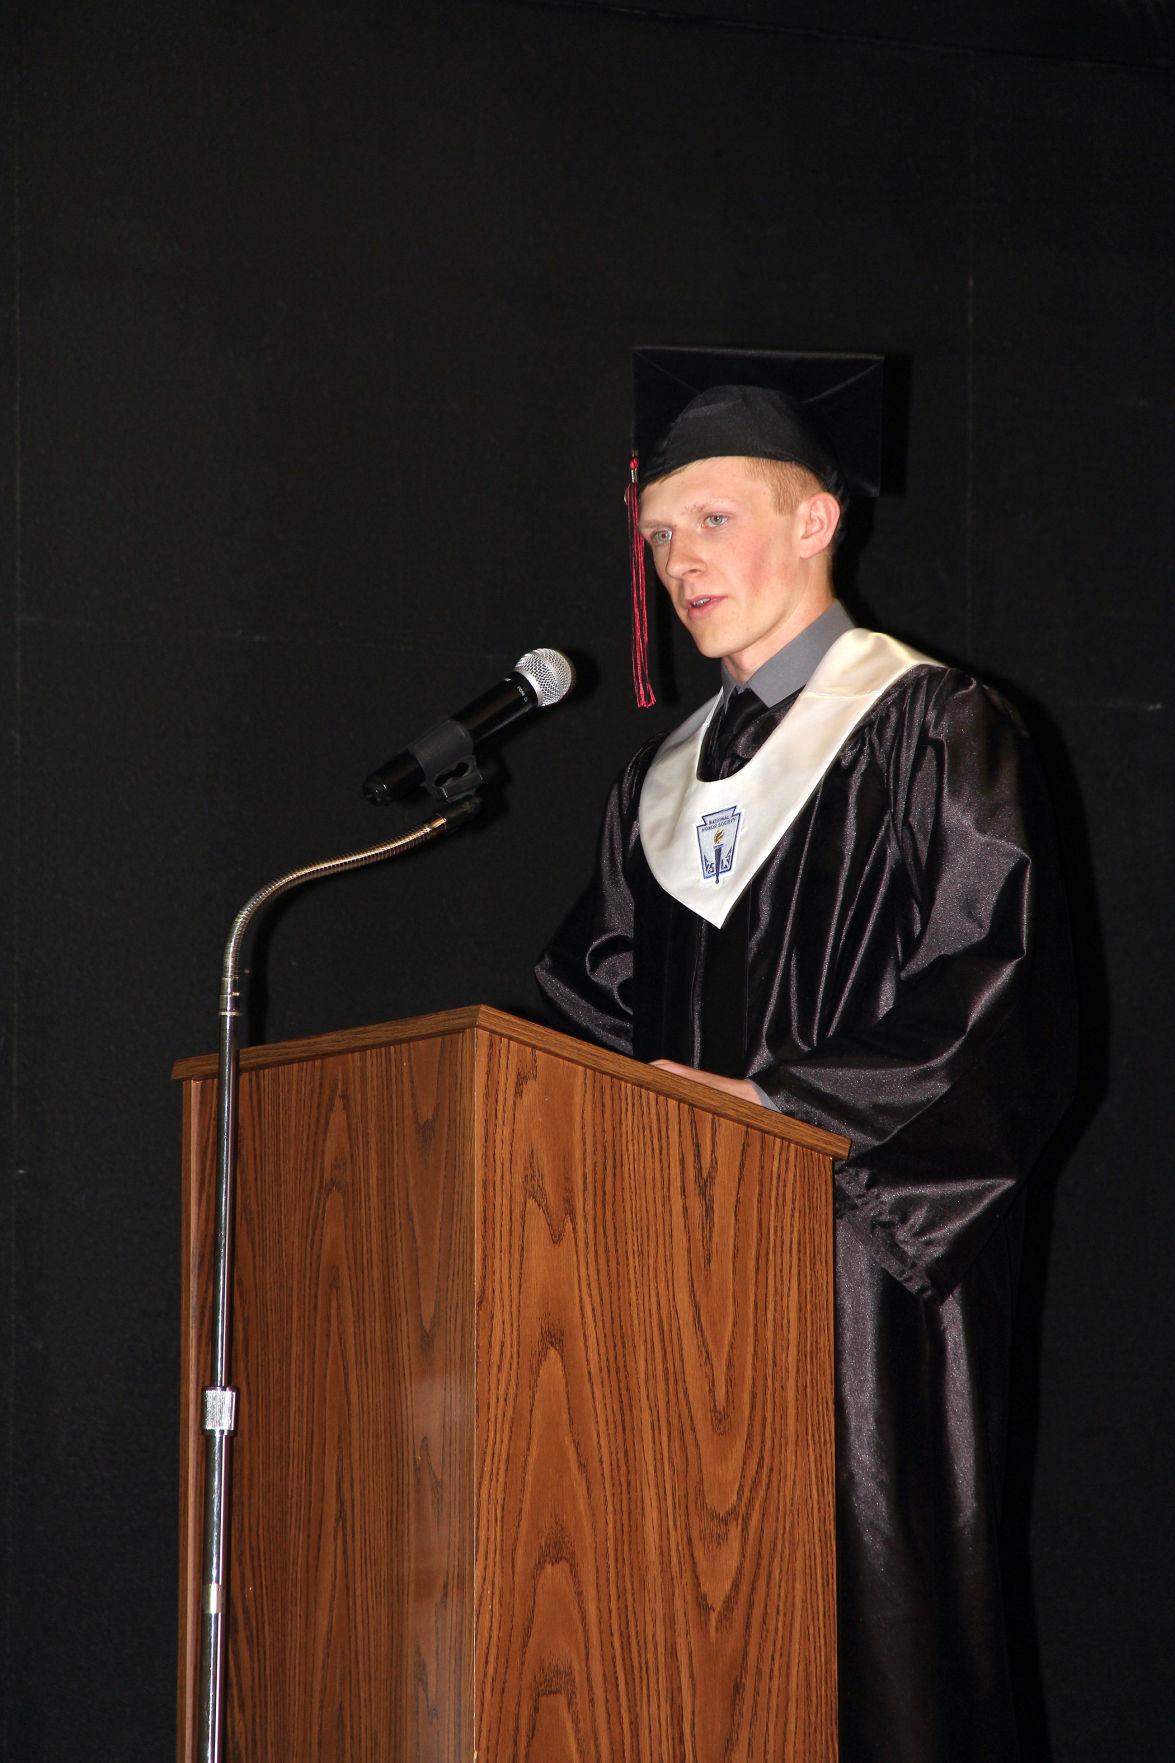 Freemyer Valedictorian speech.jpg